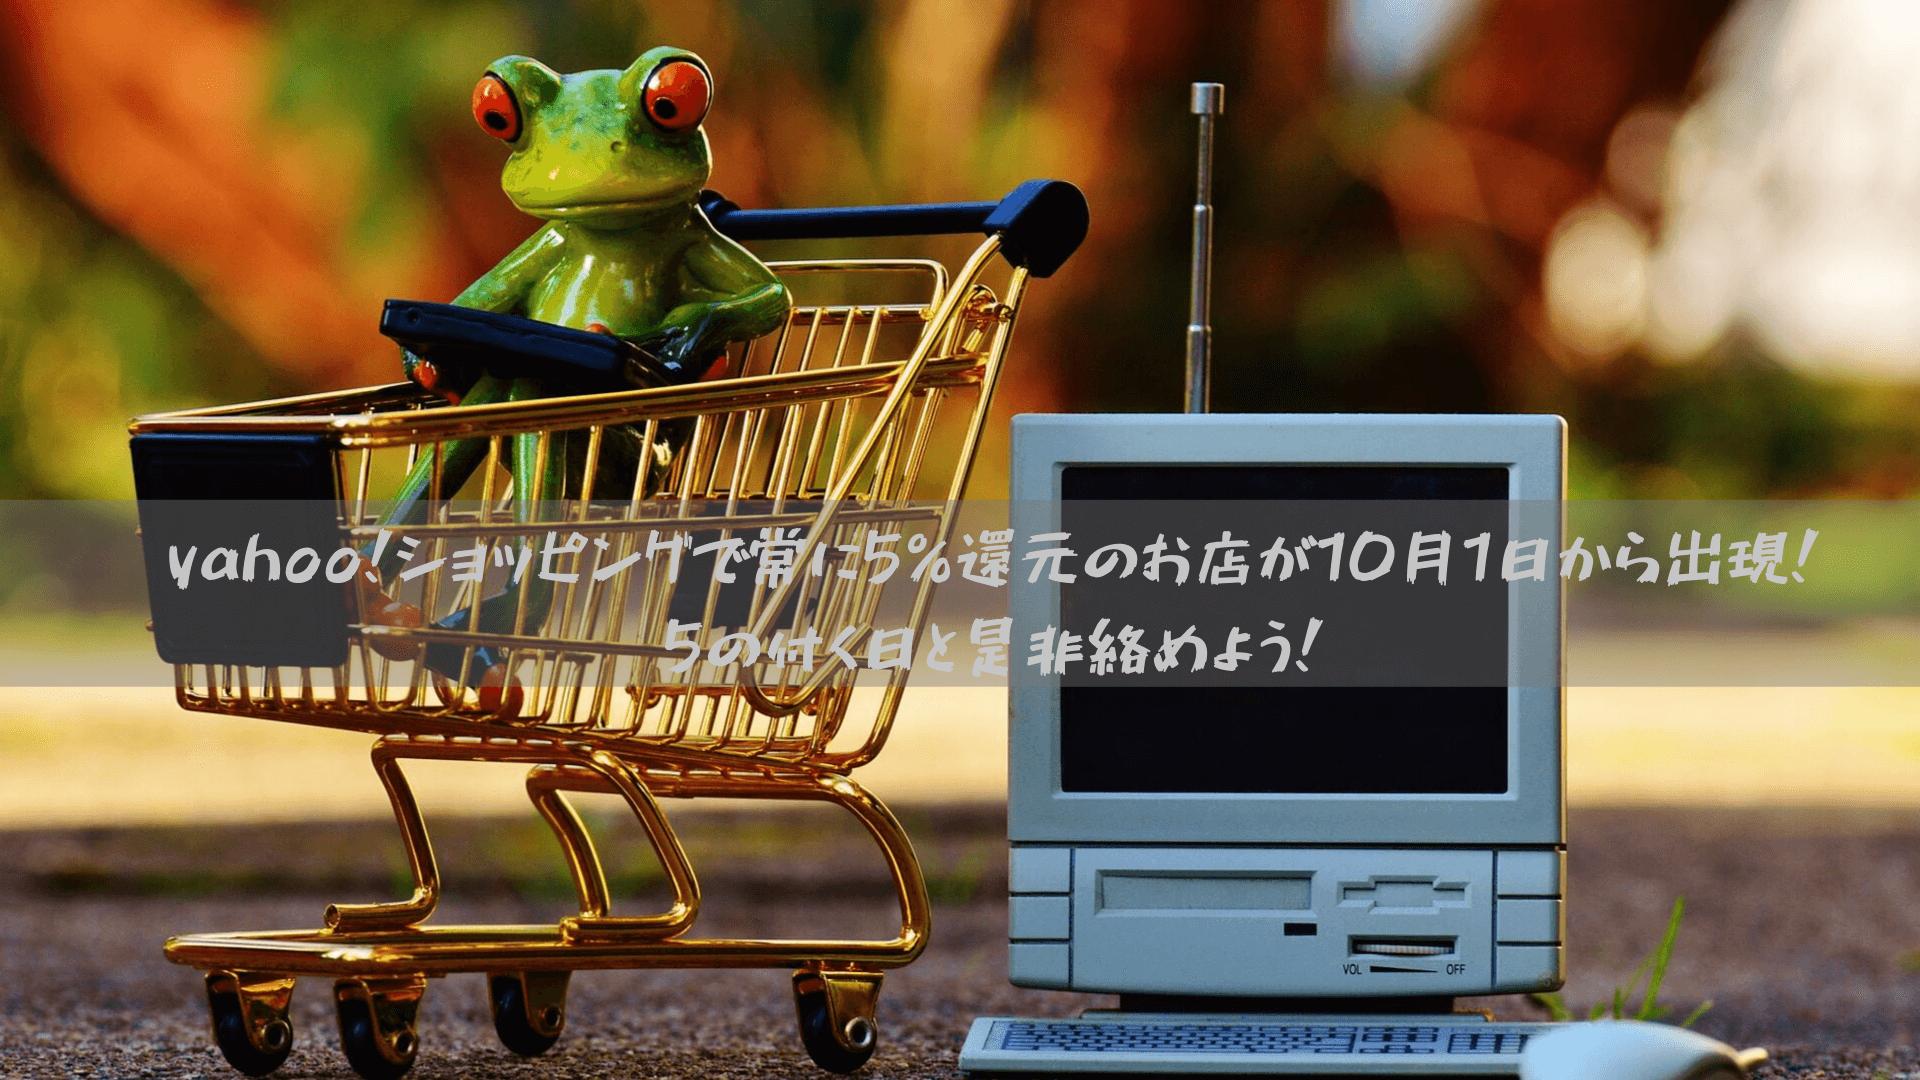 yahoo!ショッピングで常に5%還元のお店が10月1日から出現!5の付く日と是非絡めよう!